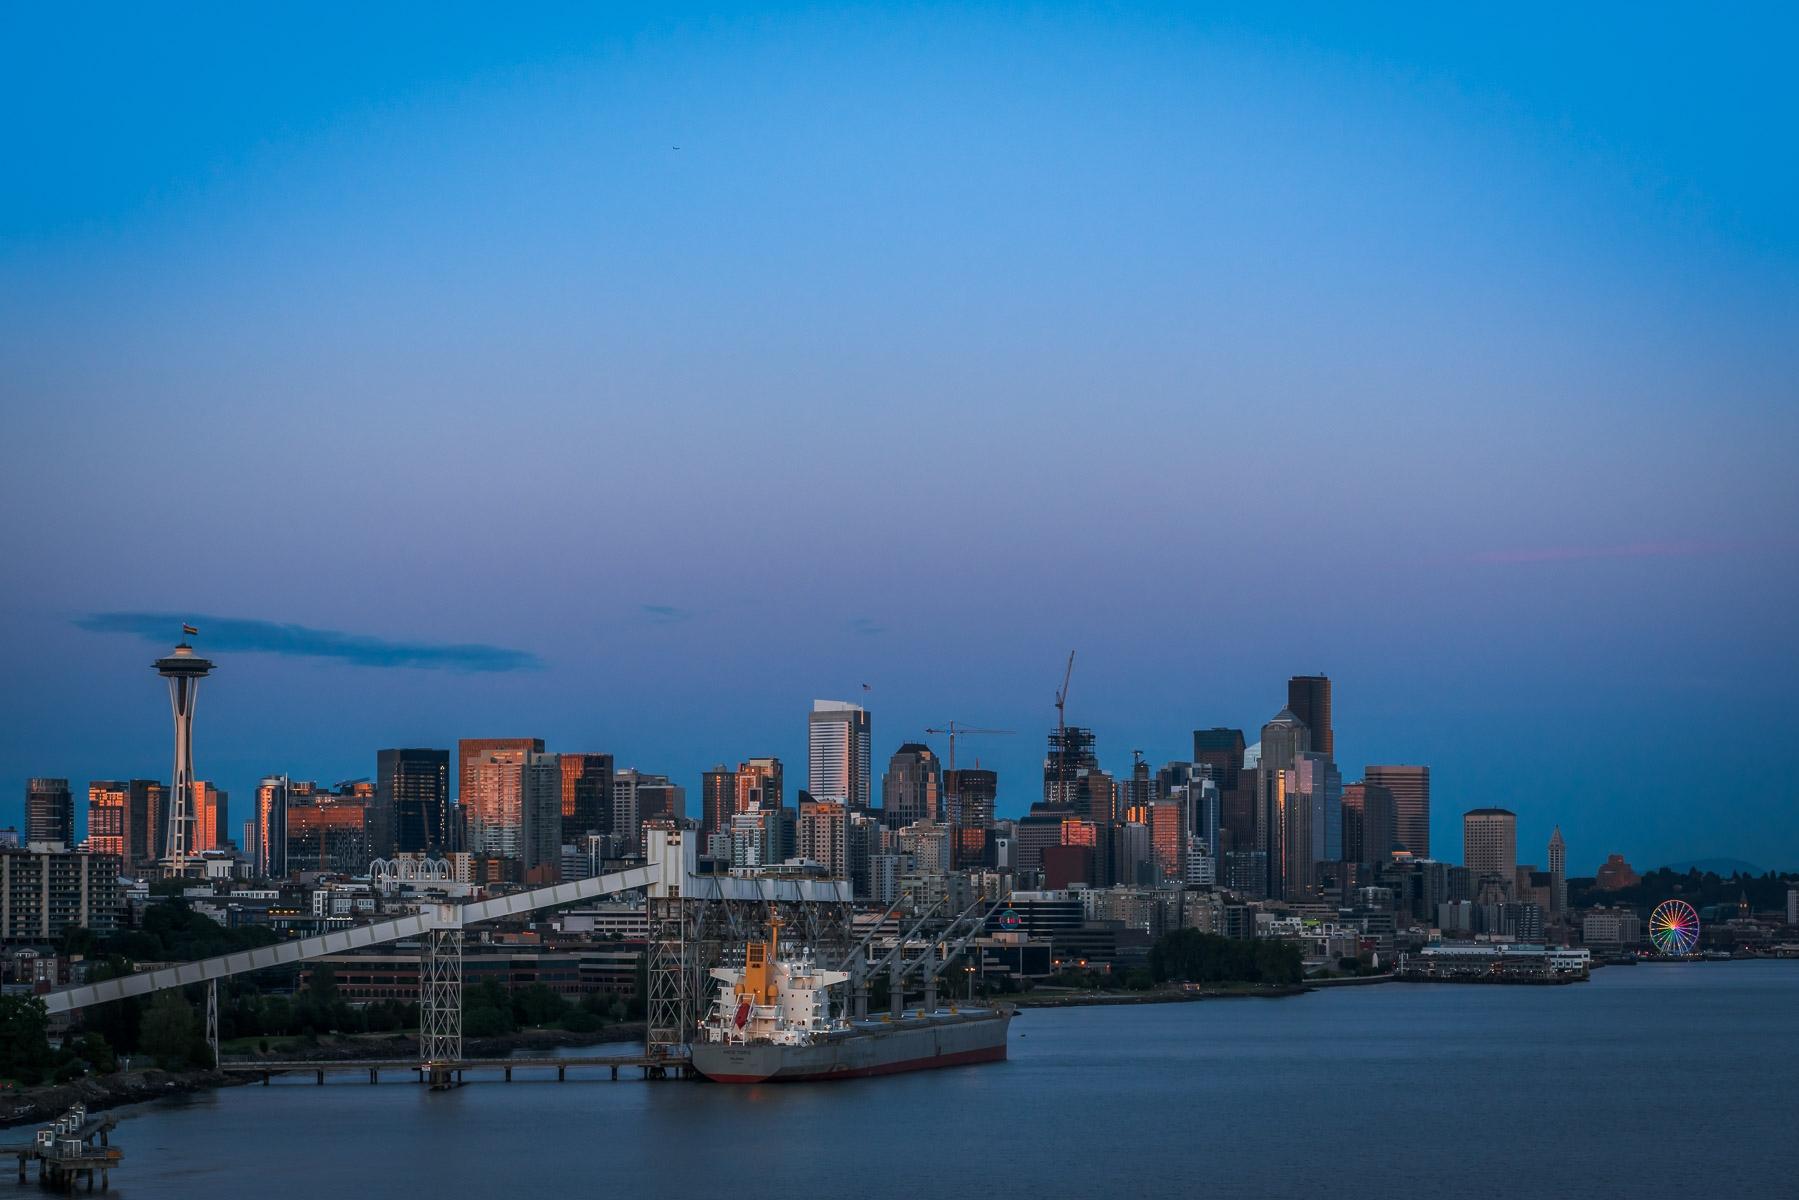 Ship Skyline light day illumina - 75centralphotography | ello